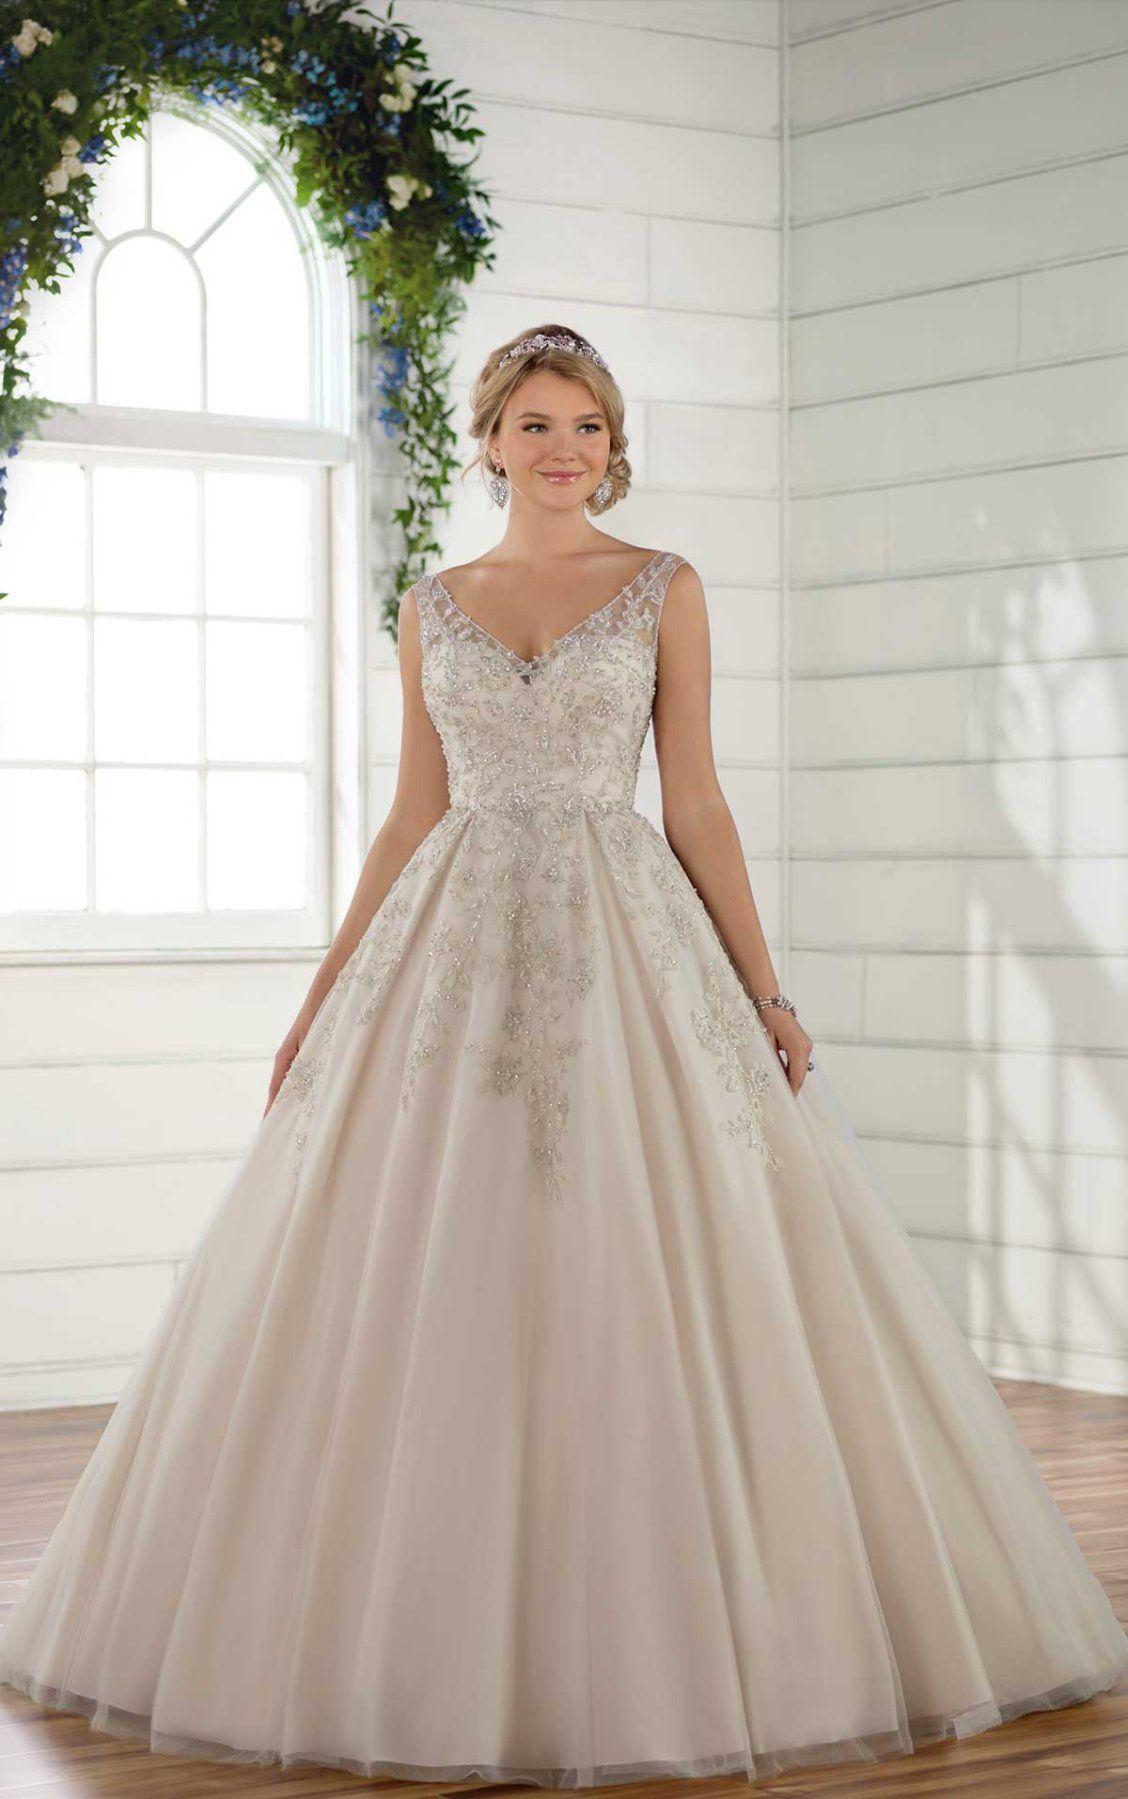 Essense wedding dress  Dramatic Ballgown Wedding Dress  Wedding Ideas  Pinterest  Beaded